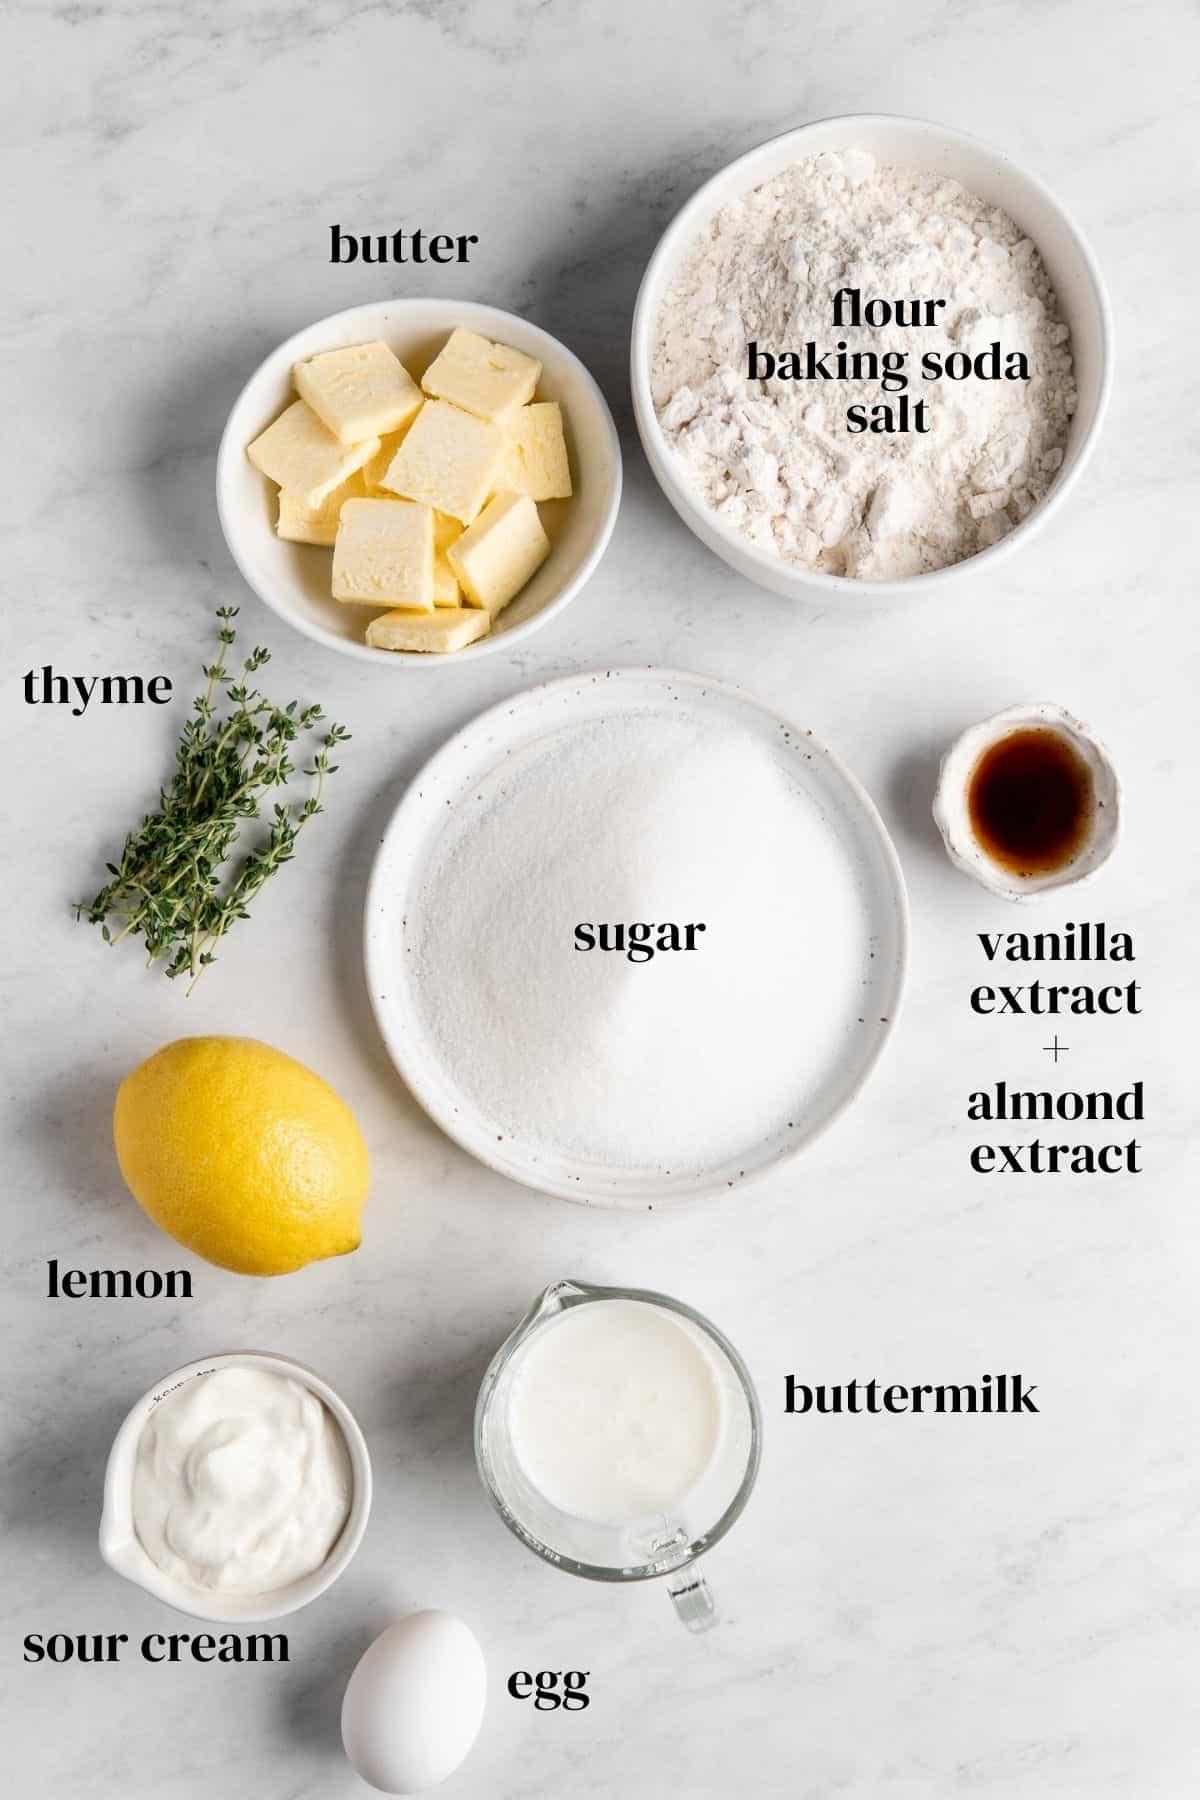 butter, flour, baking soda, salt, vanilla extract, almond extract, buttermilk, sour cream, lemon, sugar, thyme in small bowls.